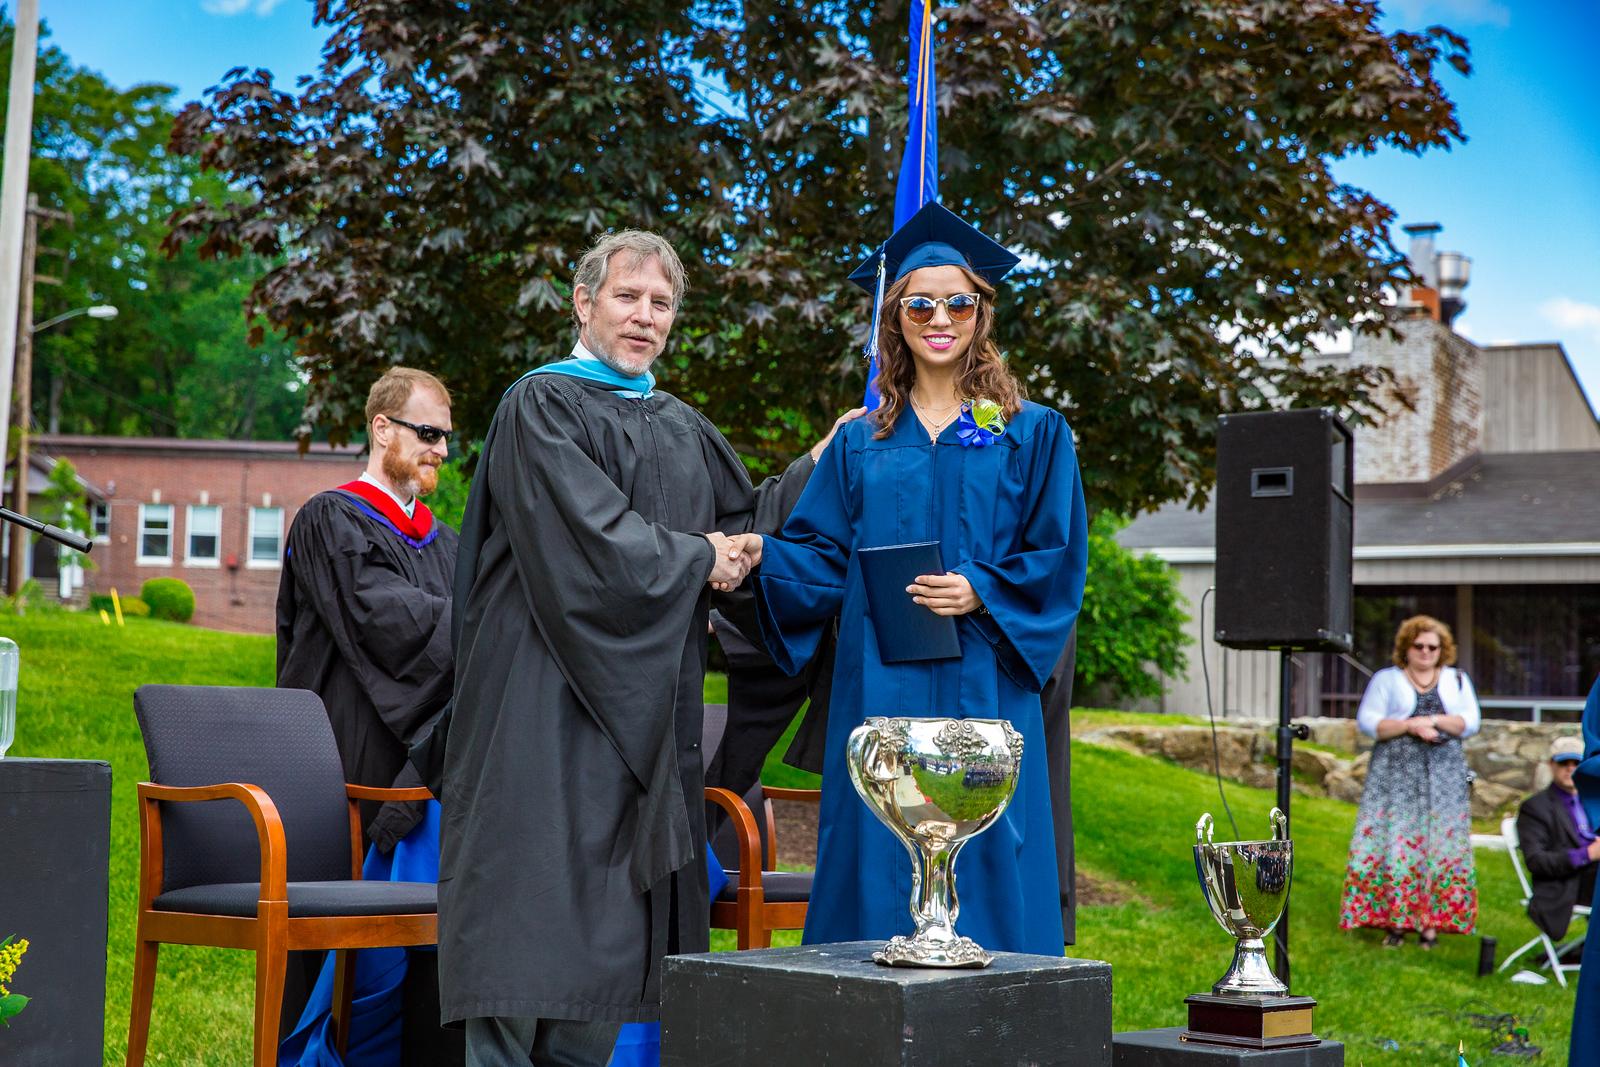 Headmaster Lamb congratulates Ines Borbon-Bours upon receiving her diploma